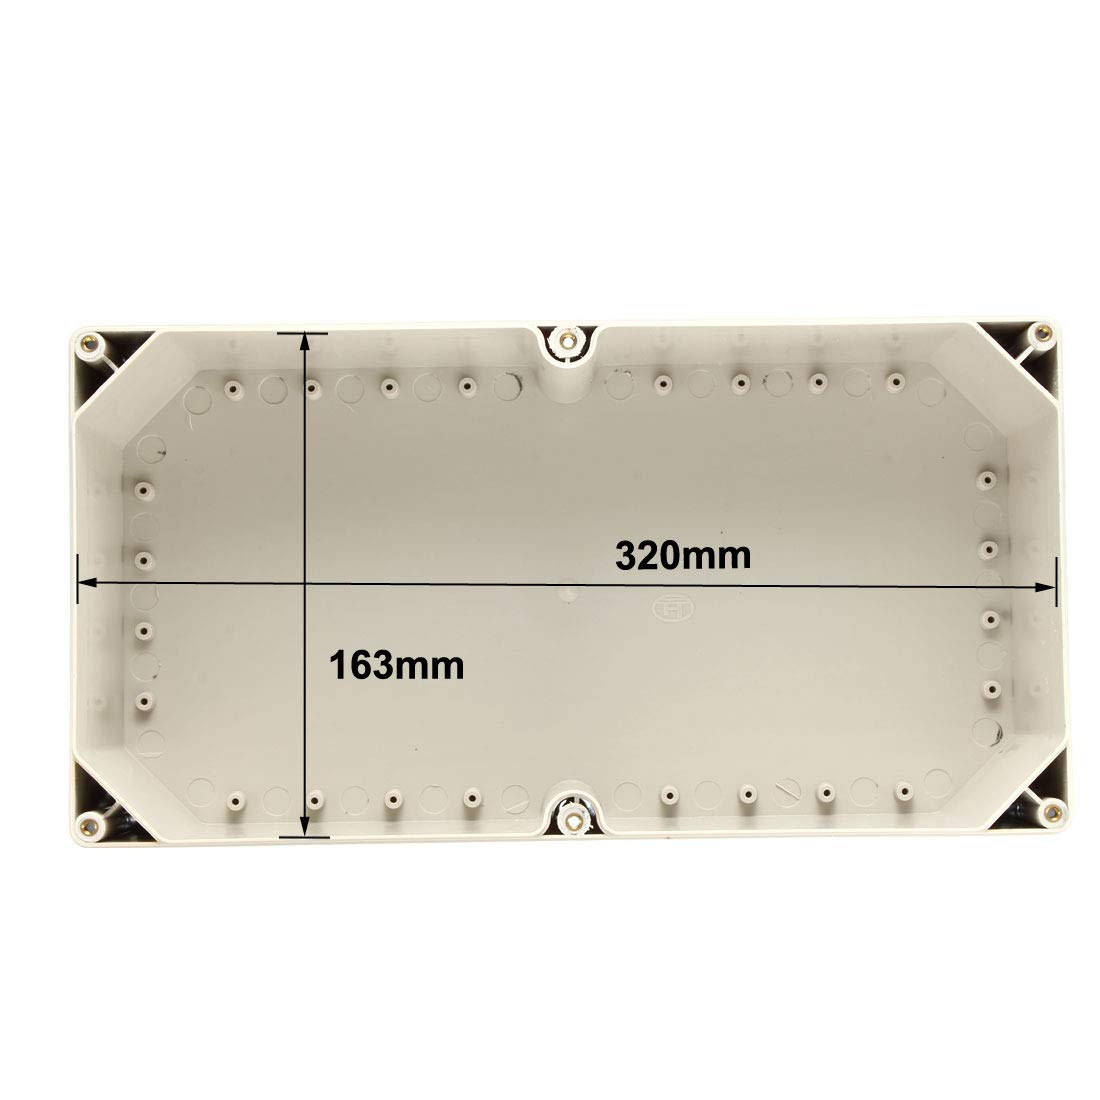 70 sourcing map 2 Stk 53mm Elektronische ABS DIY Kunststoff Grau DE de Anschlussdose Geh/äuse 112